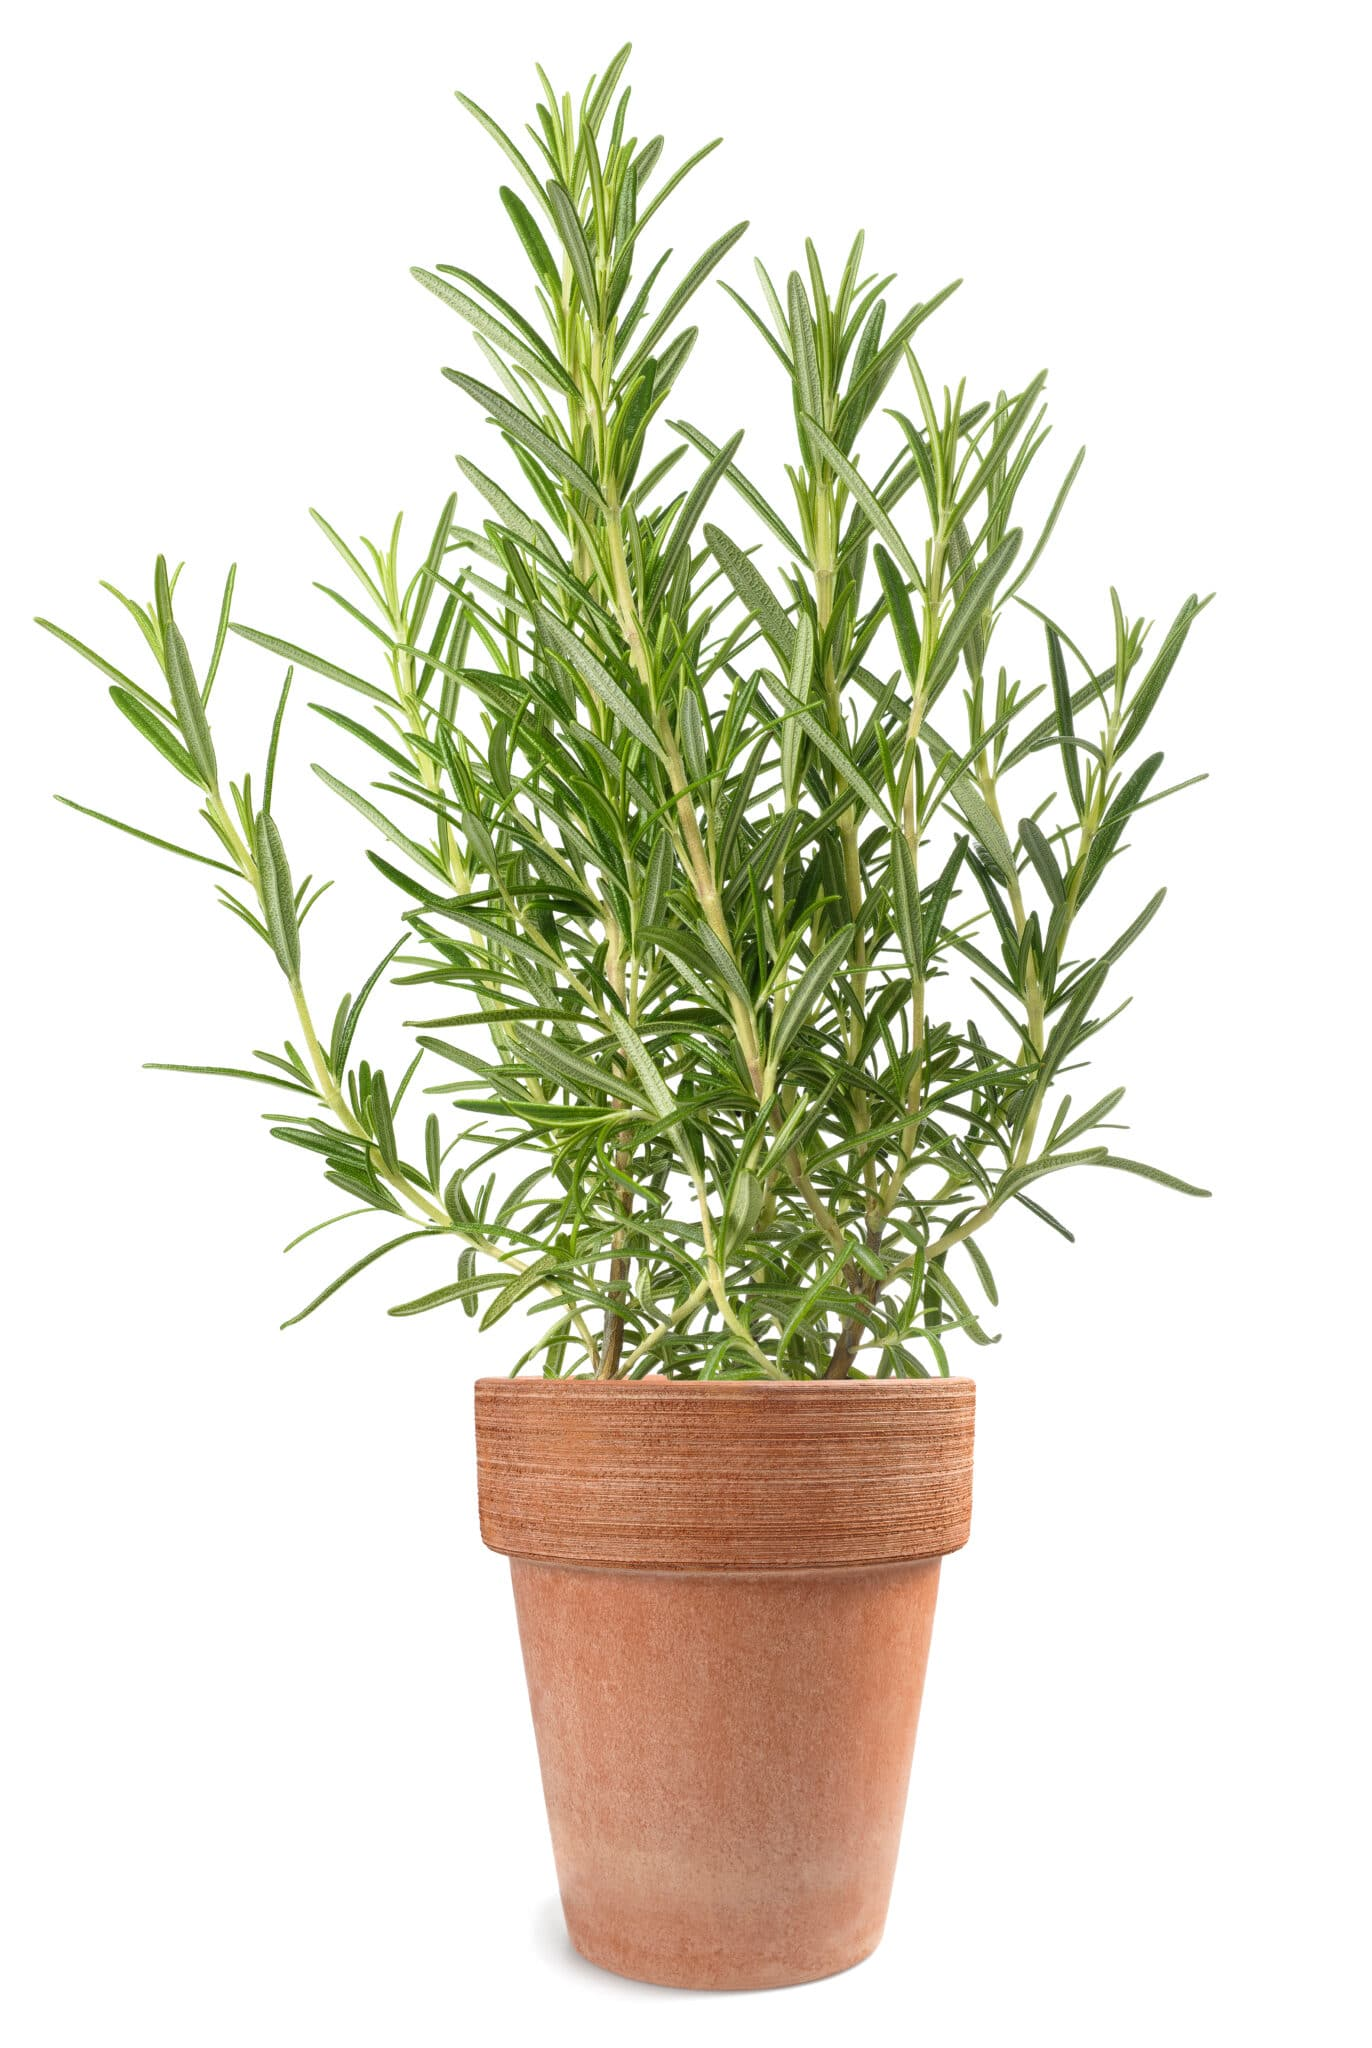 rosemary plant in vase isolated on white background